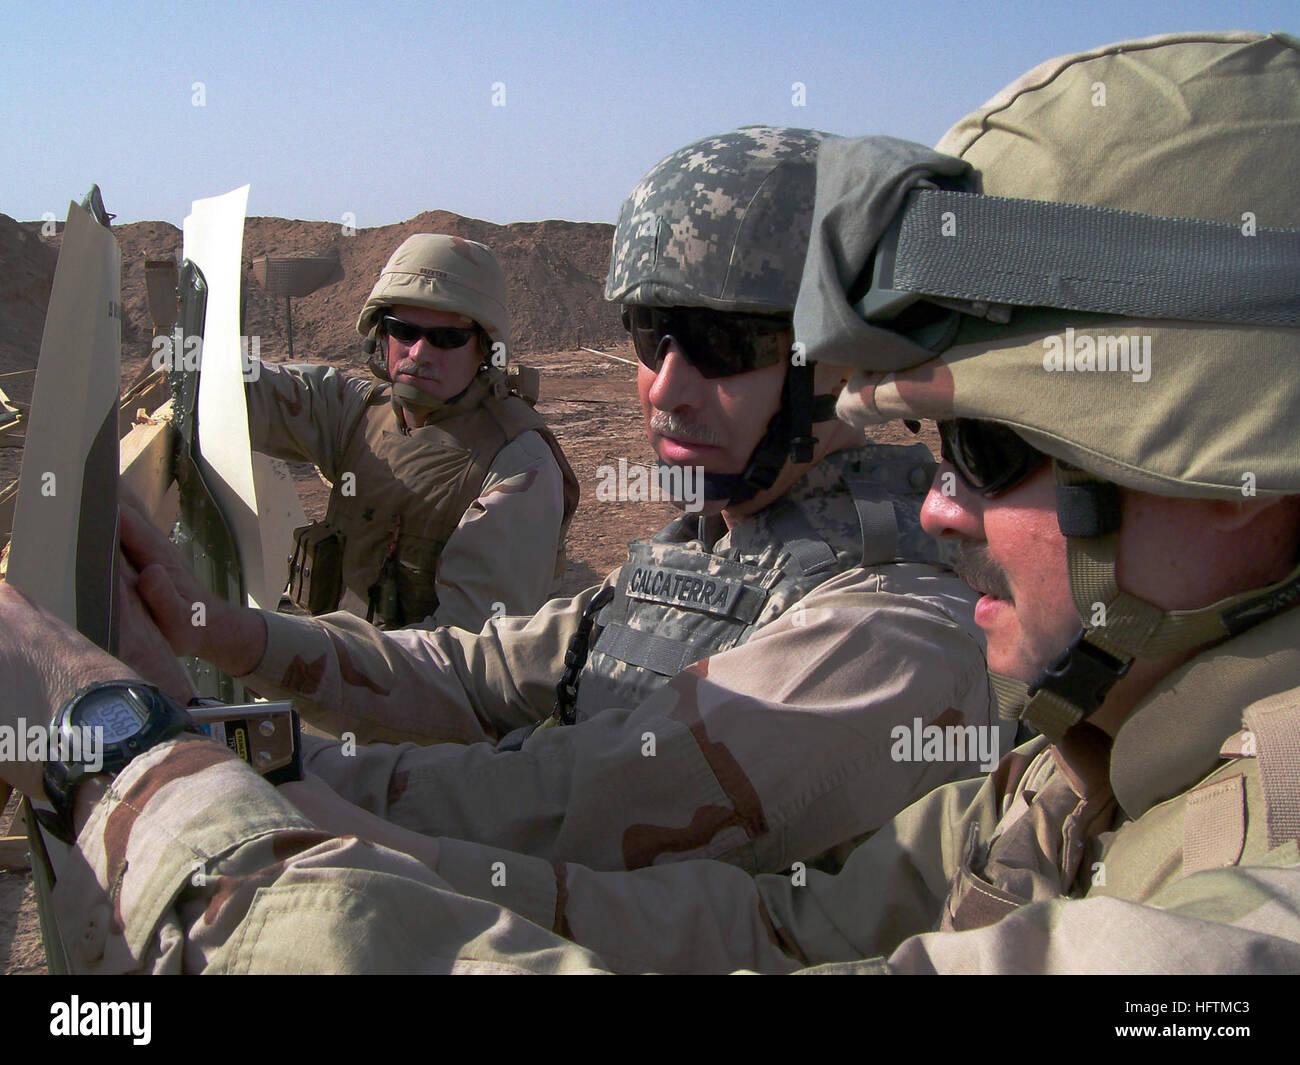 070419-N-8275M-009  CAMP FALLUJAH, Iraq (April 19, 2007) - Yeoman 1st Class Mark Calcaterra helps Lt. Peter Simmons Stock Photo